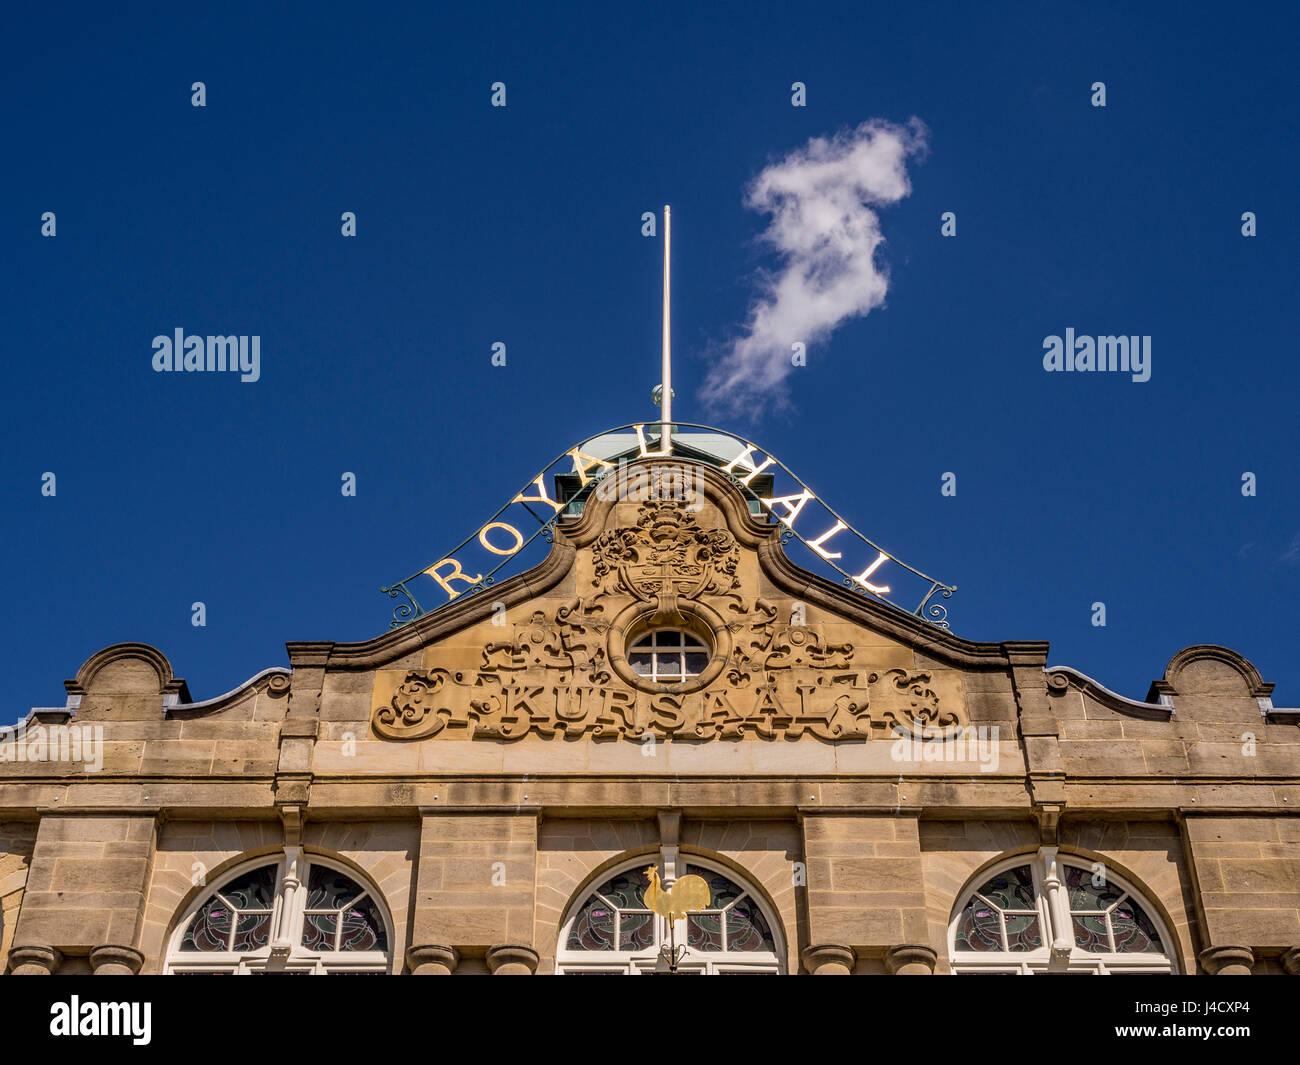 Königssaal, aufgeführt im Grade II Performance Hall und Theater, Harrogate, UK. Stockbild